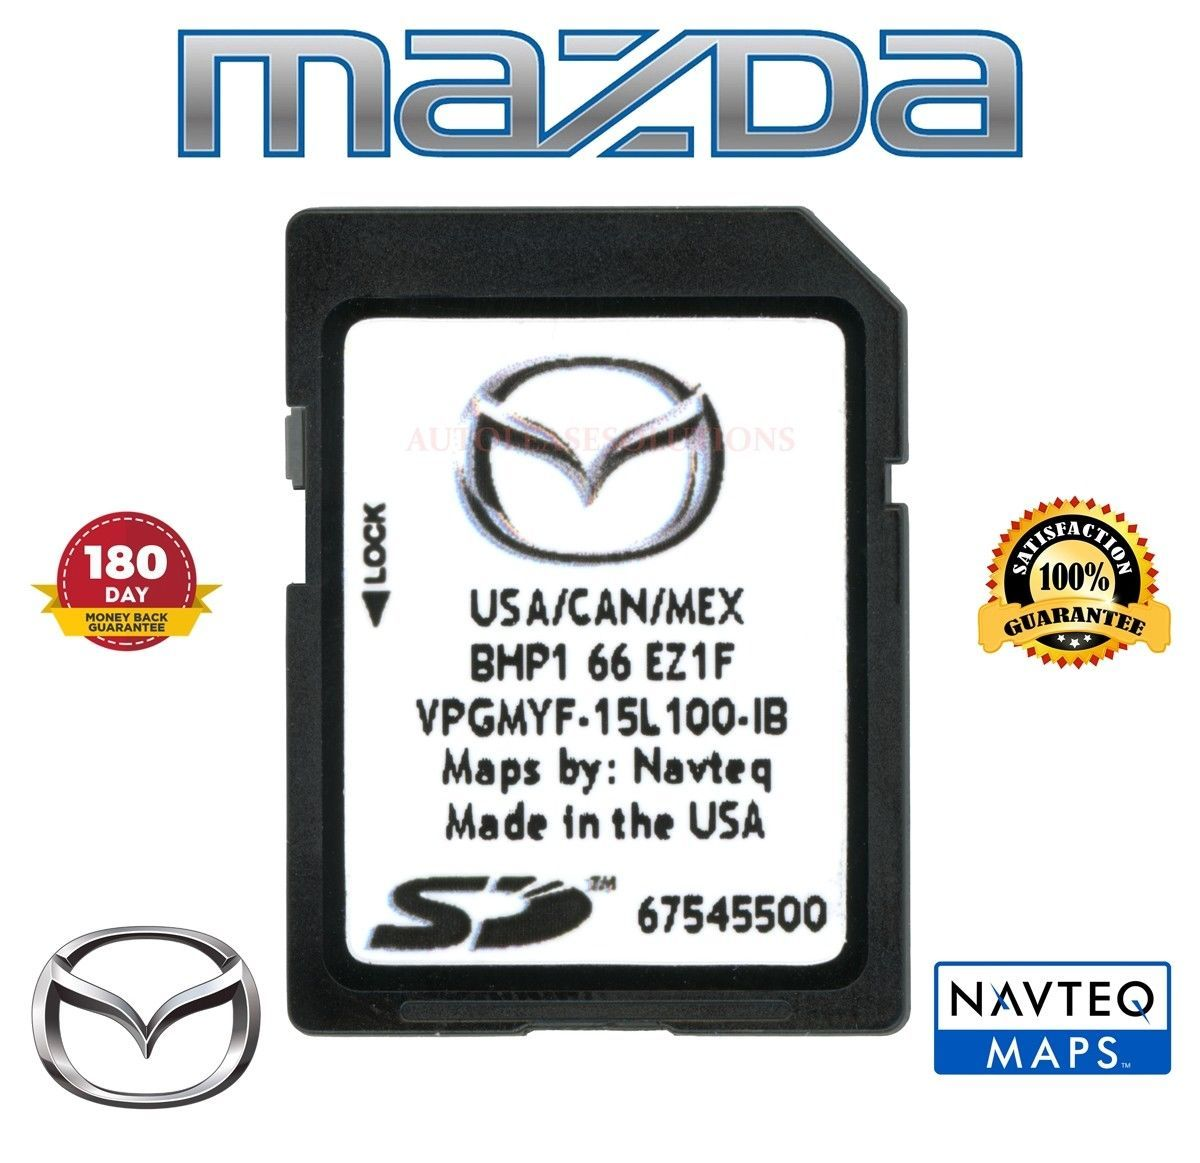 Nice Awesome 2018 2017 2016 Mazda Navigation Sd Card Bhp1 66 Ez1f 3 6